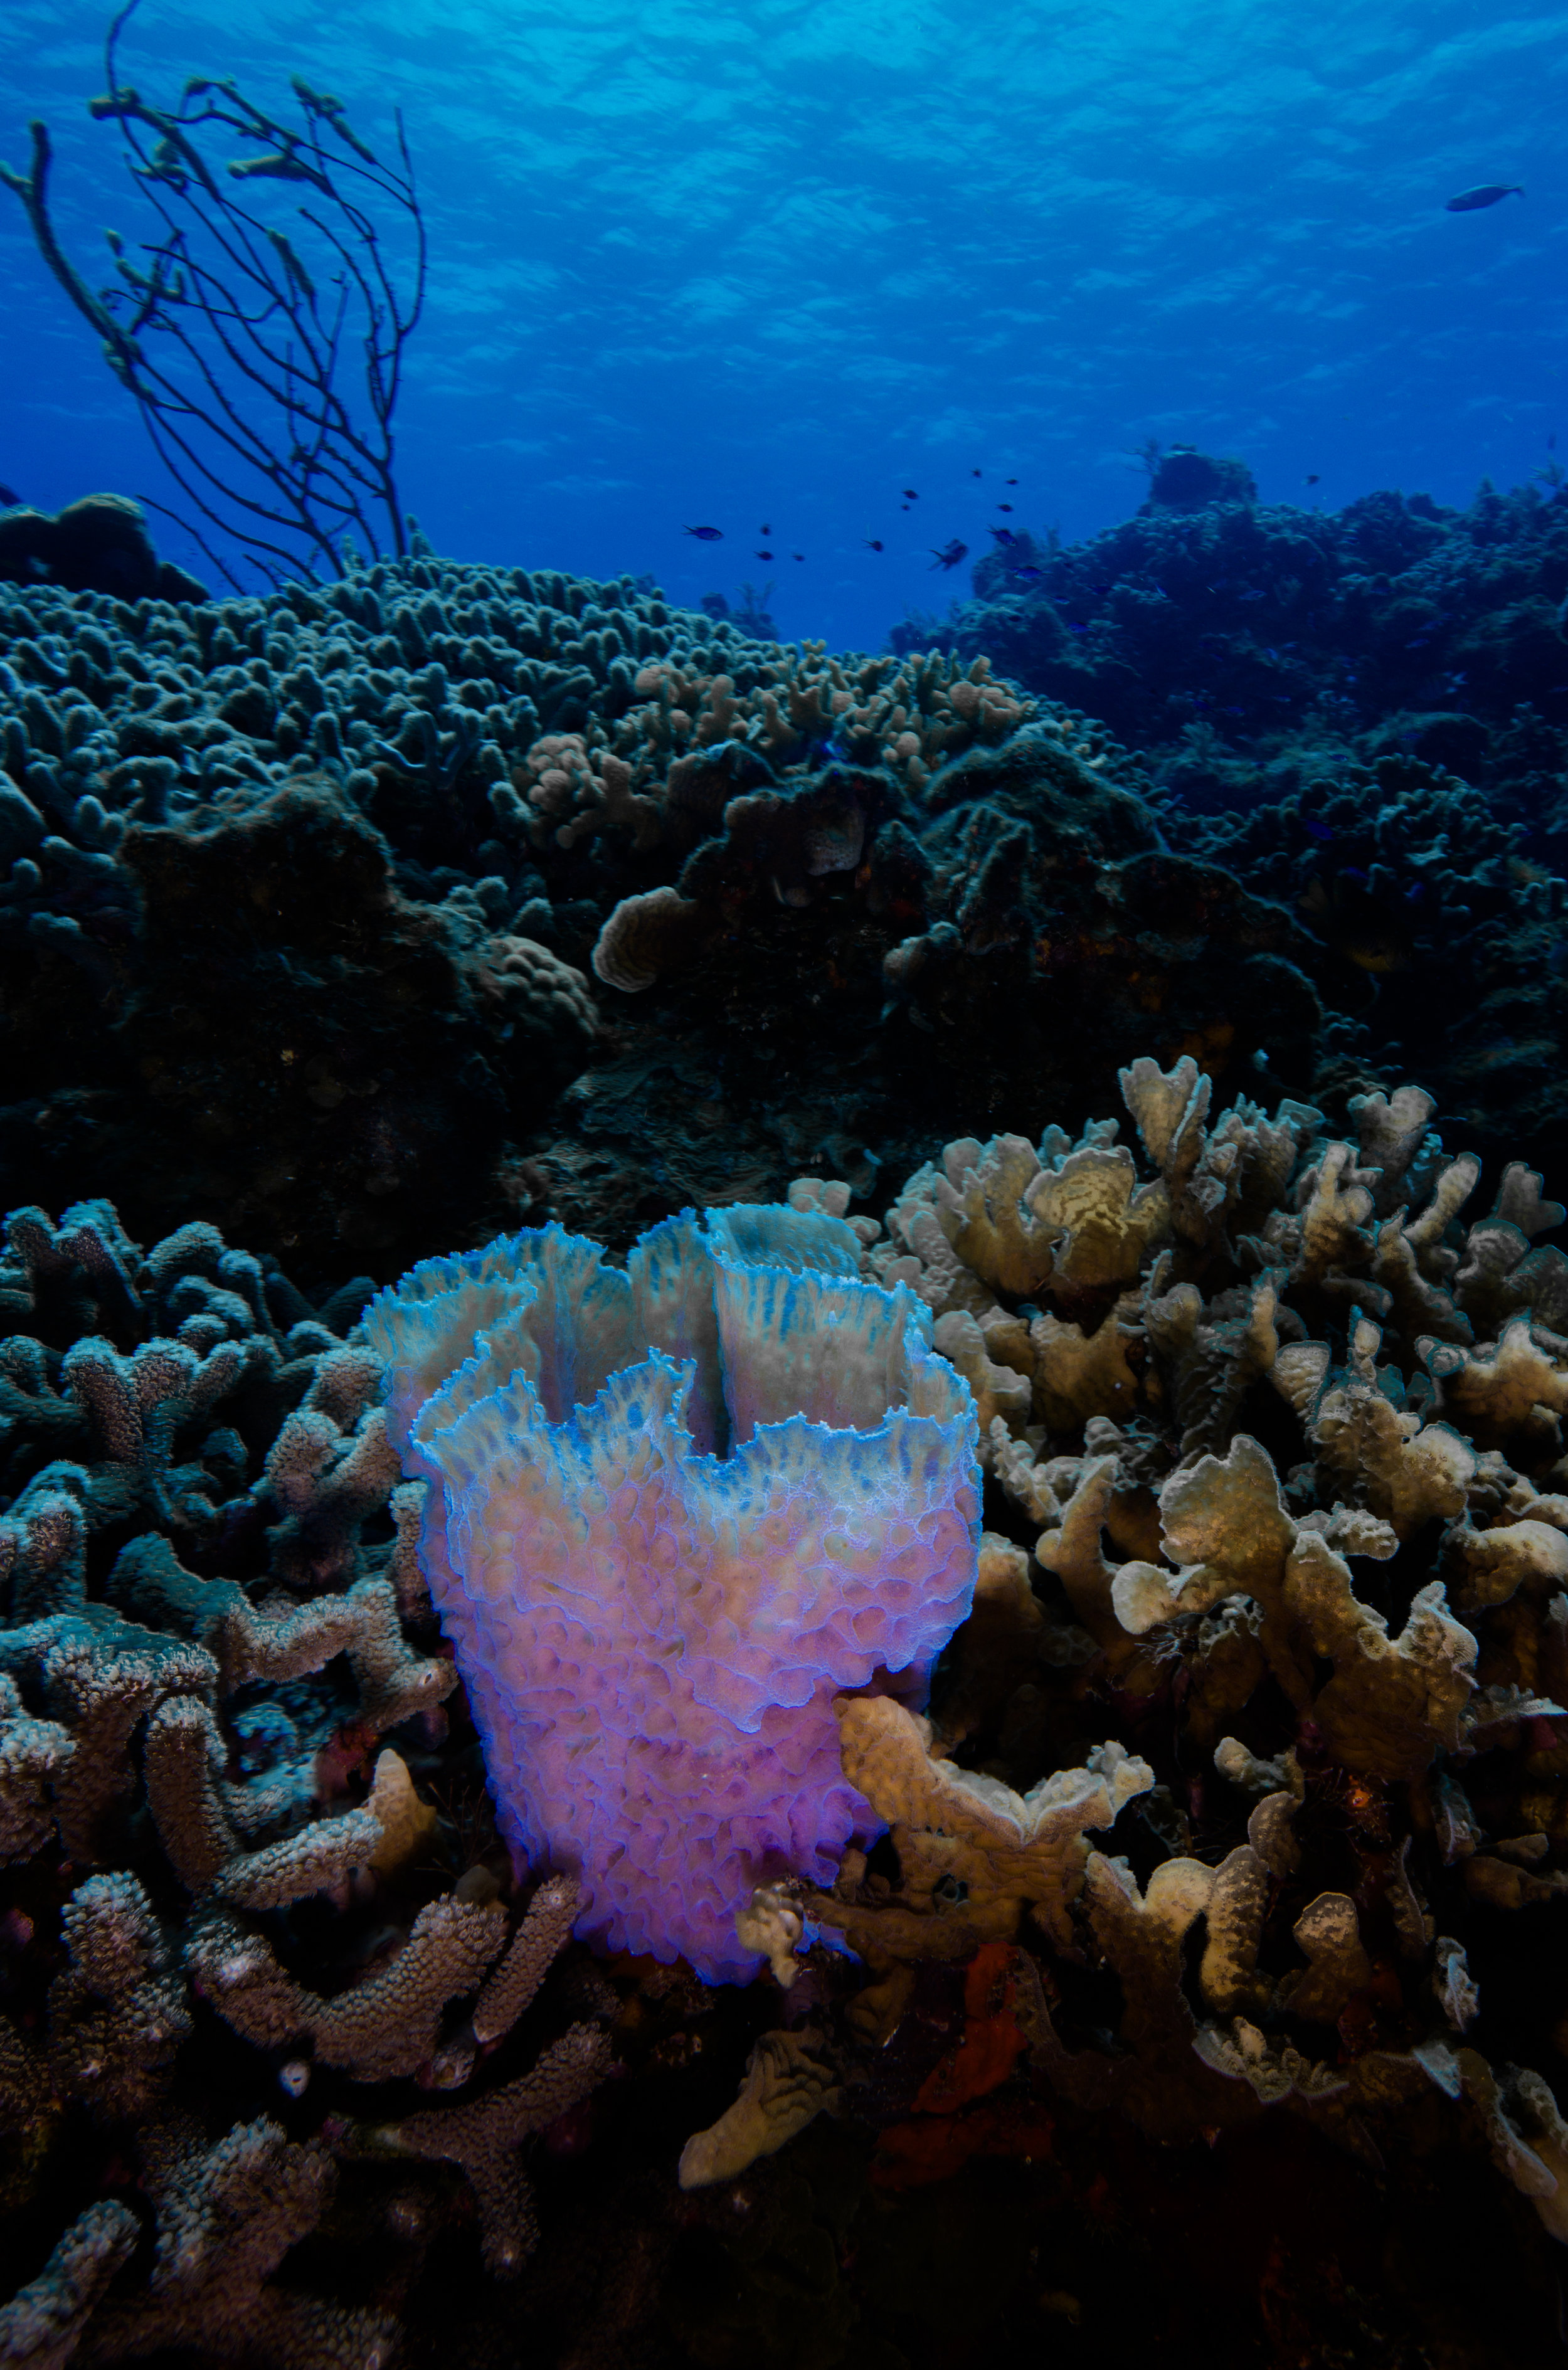 Cozumel Mexico - Underwater Photography - Azure Vase Sponge